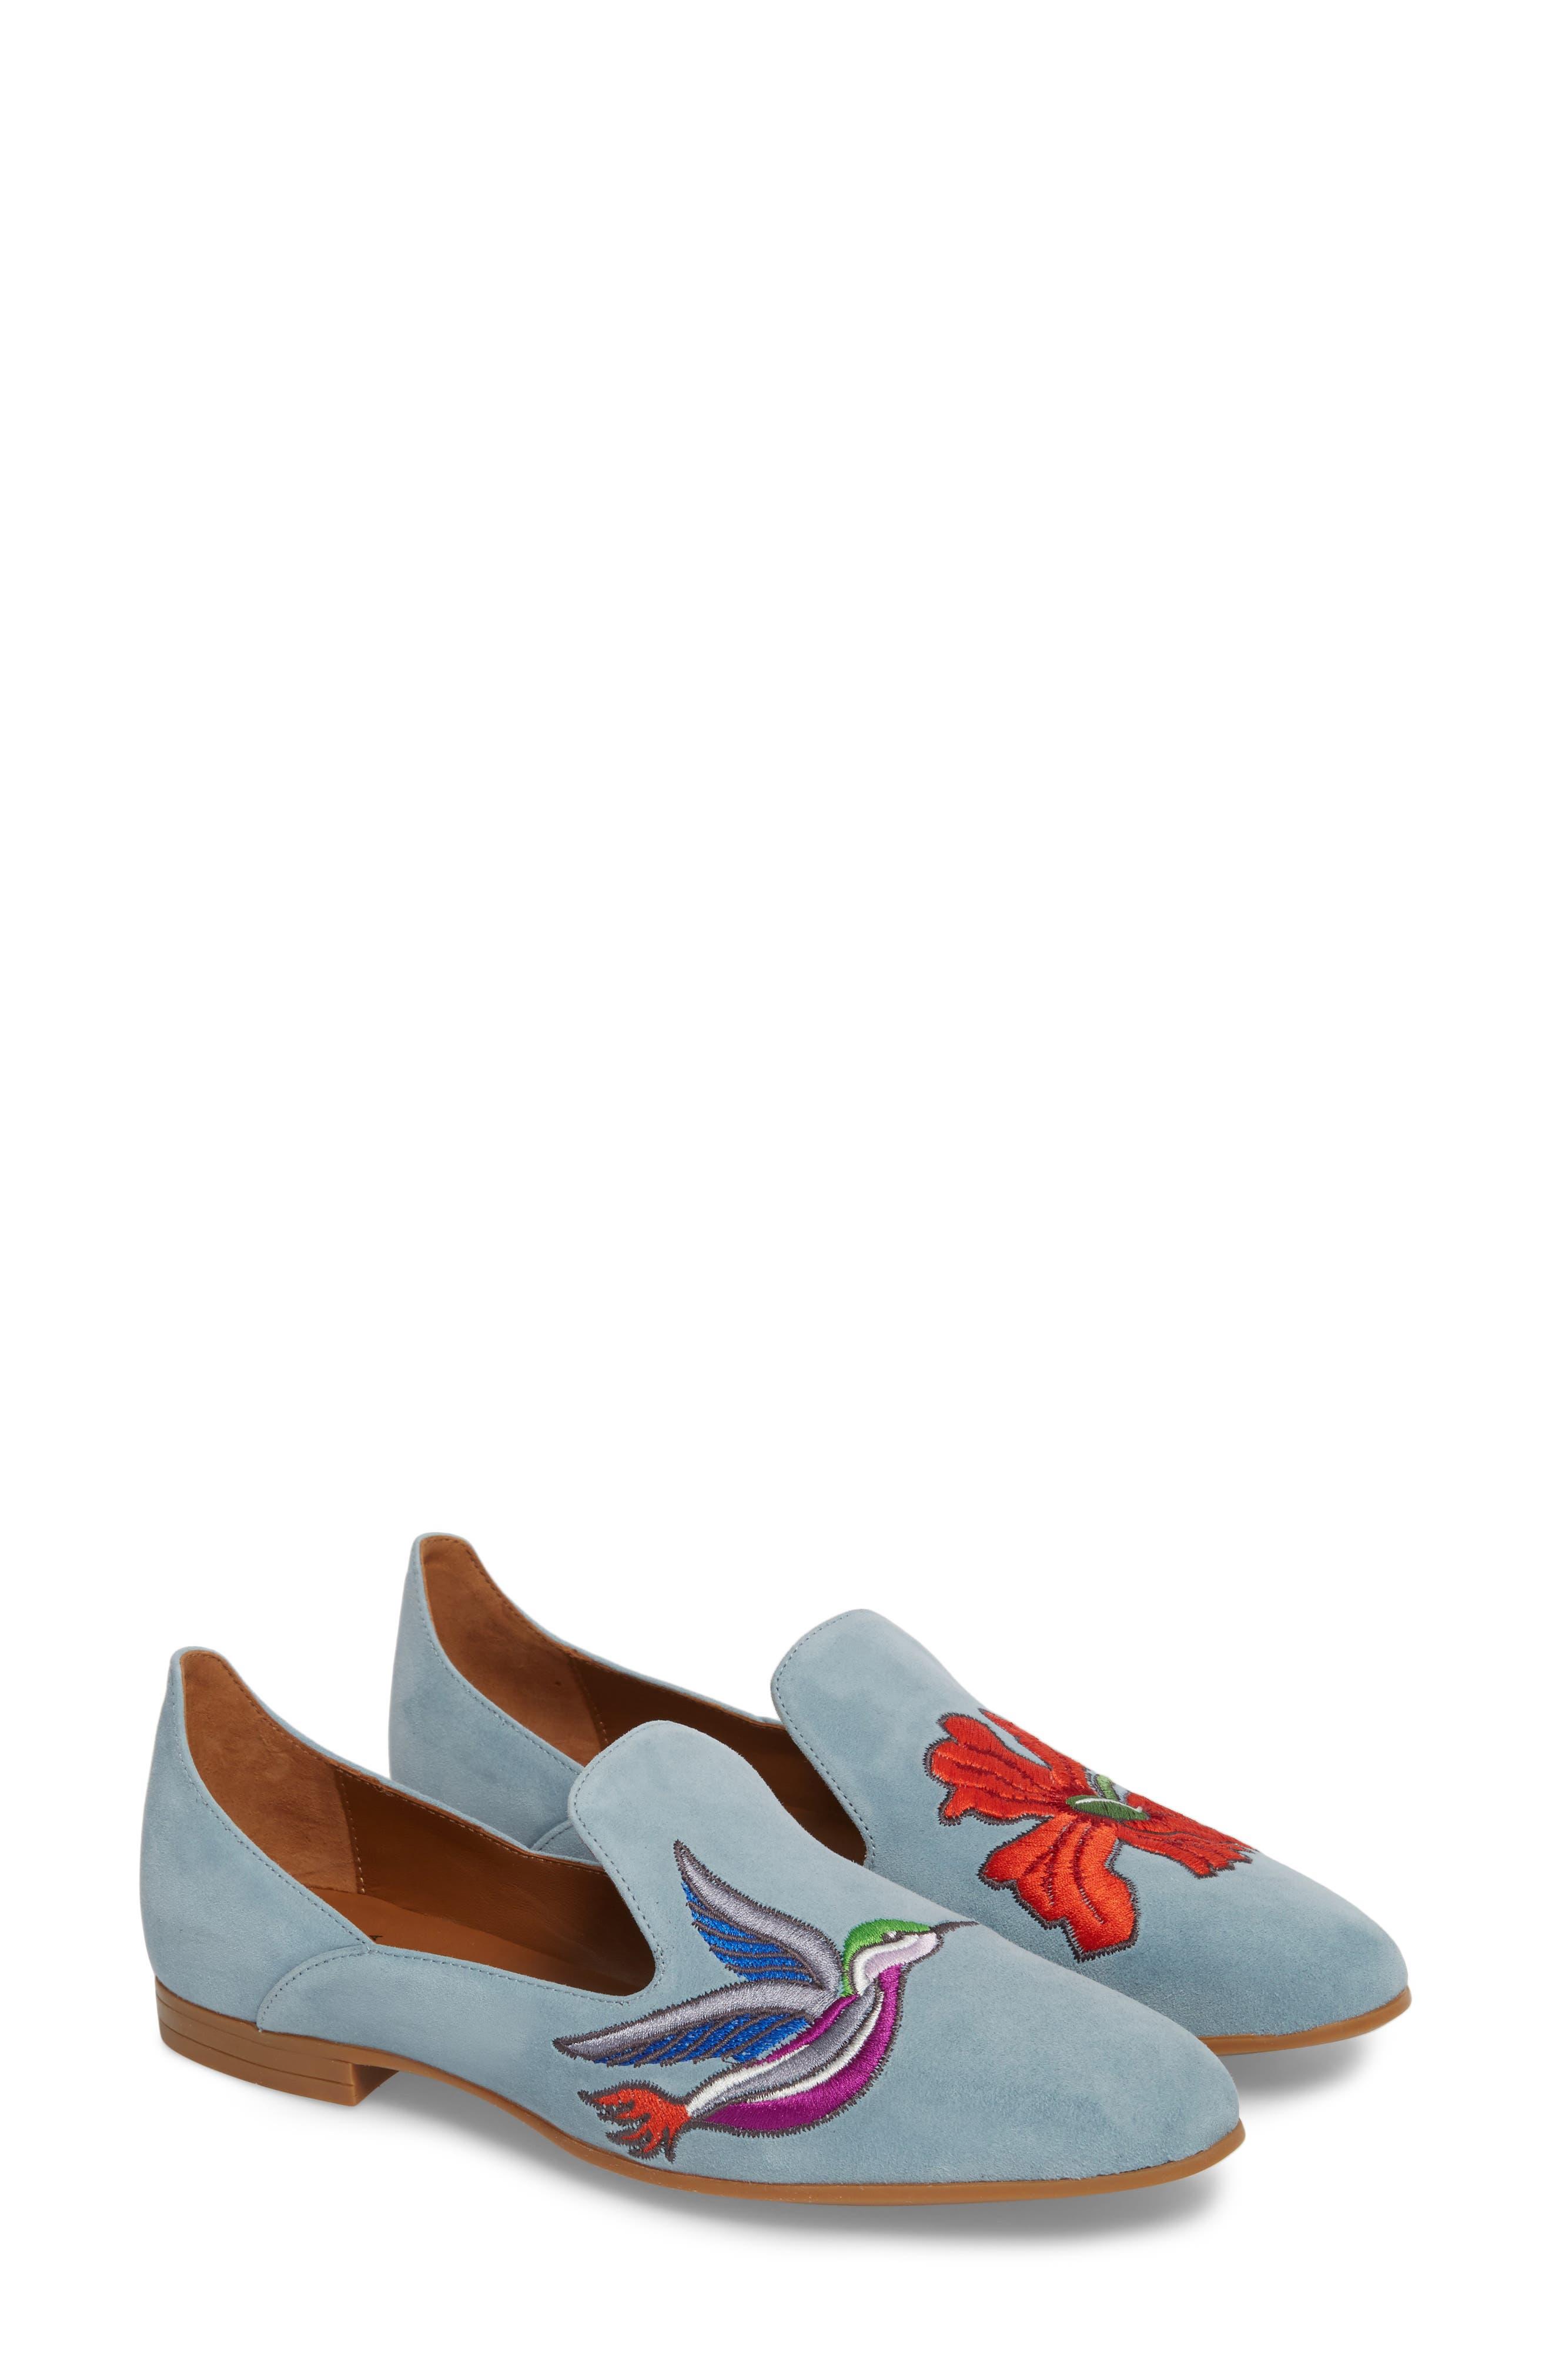 Emmaline Embroidered Loafer,                             Alternate thumbnail 6, color,